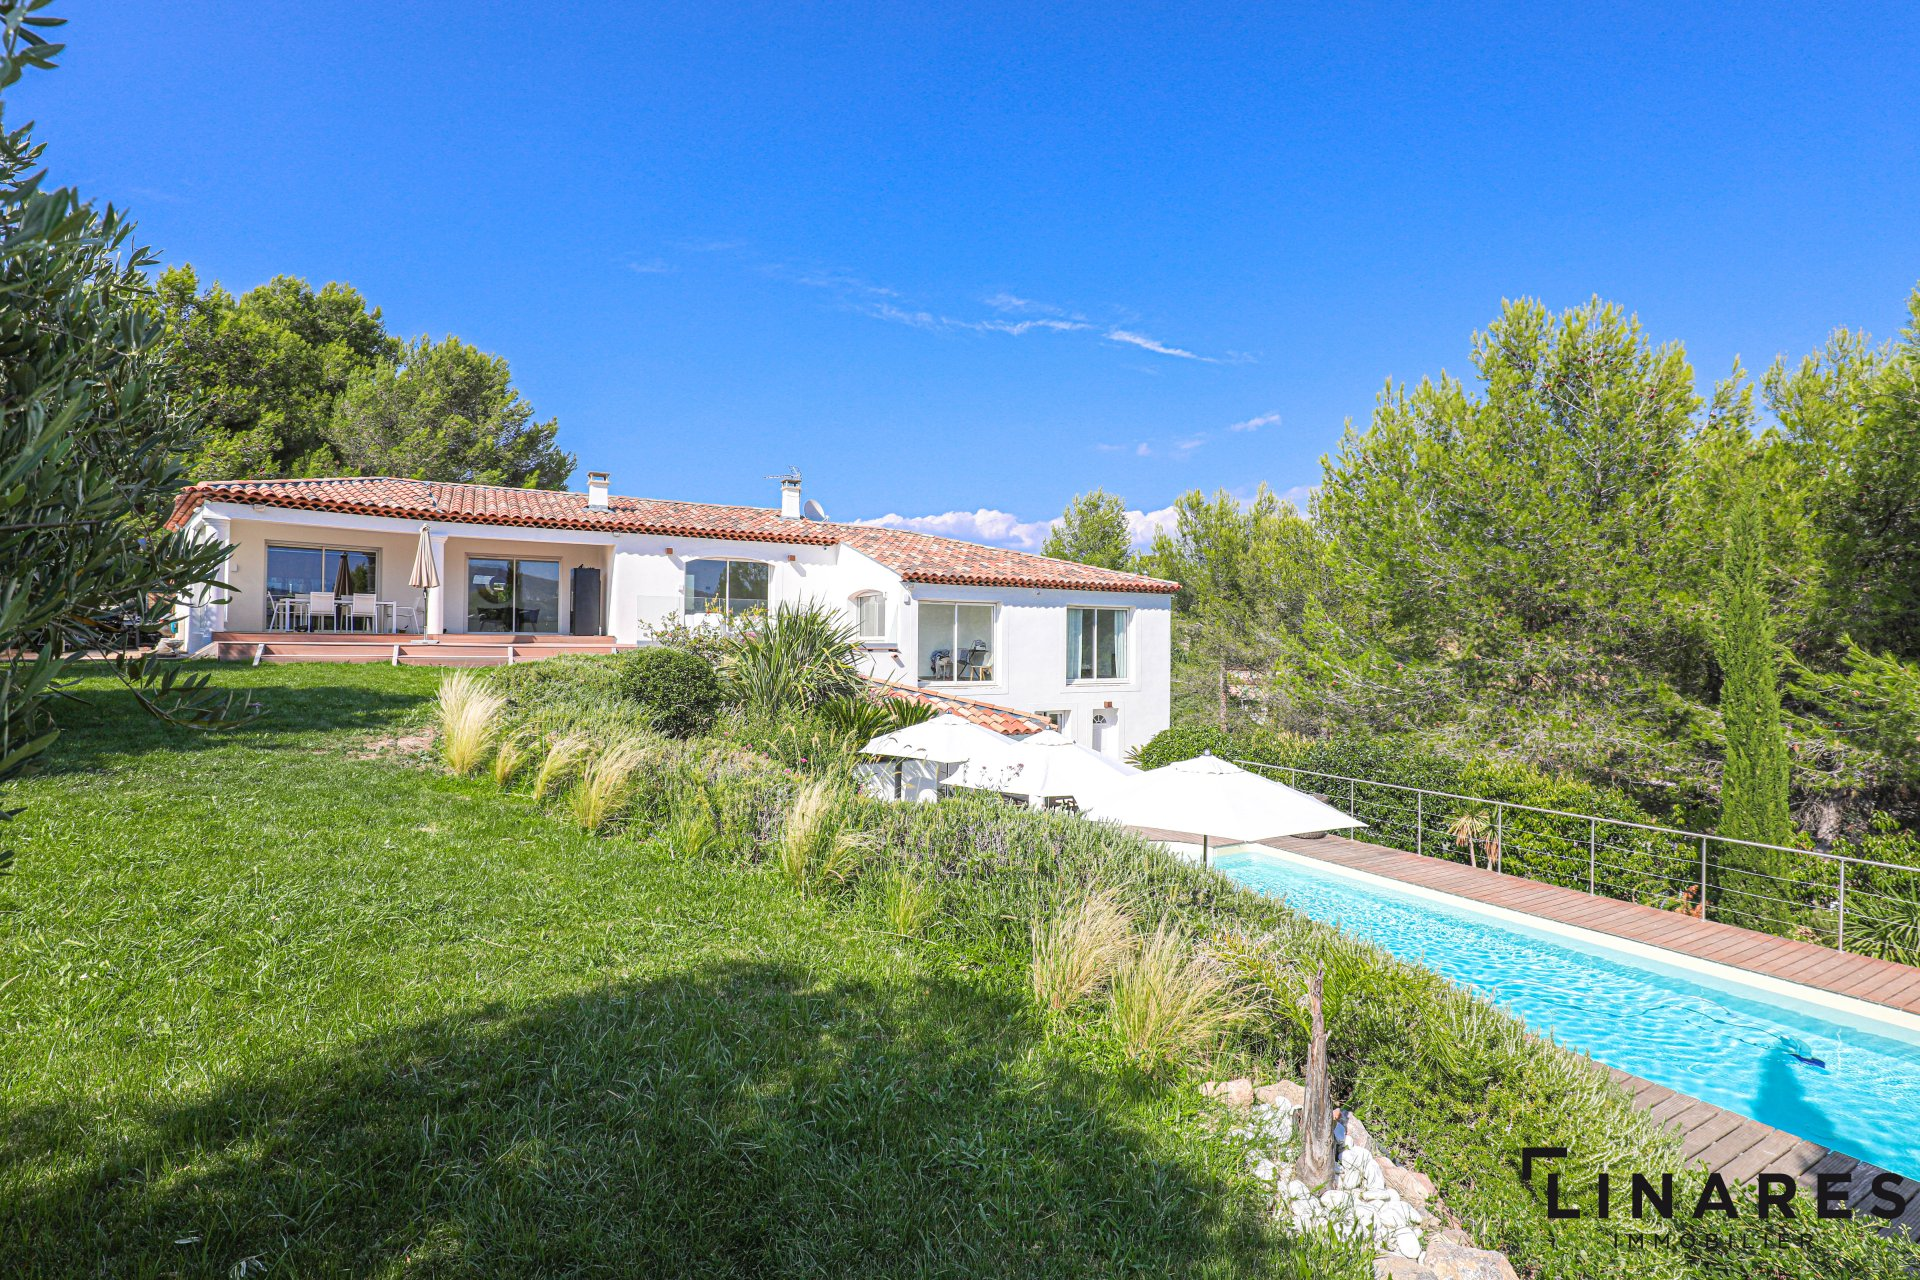 GREEN IMMERSION - Villa T5 de 250m2 Terrain 2006m2 + Studio indépendant 13011